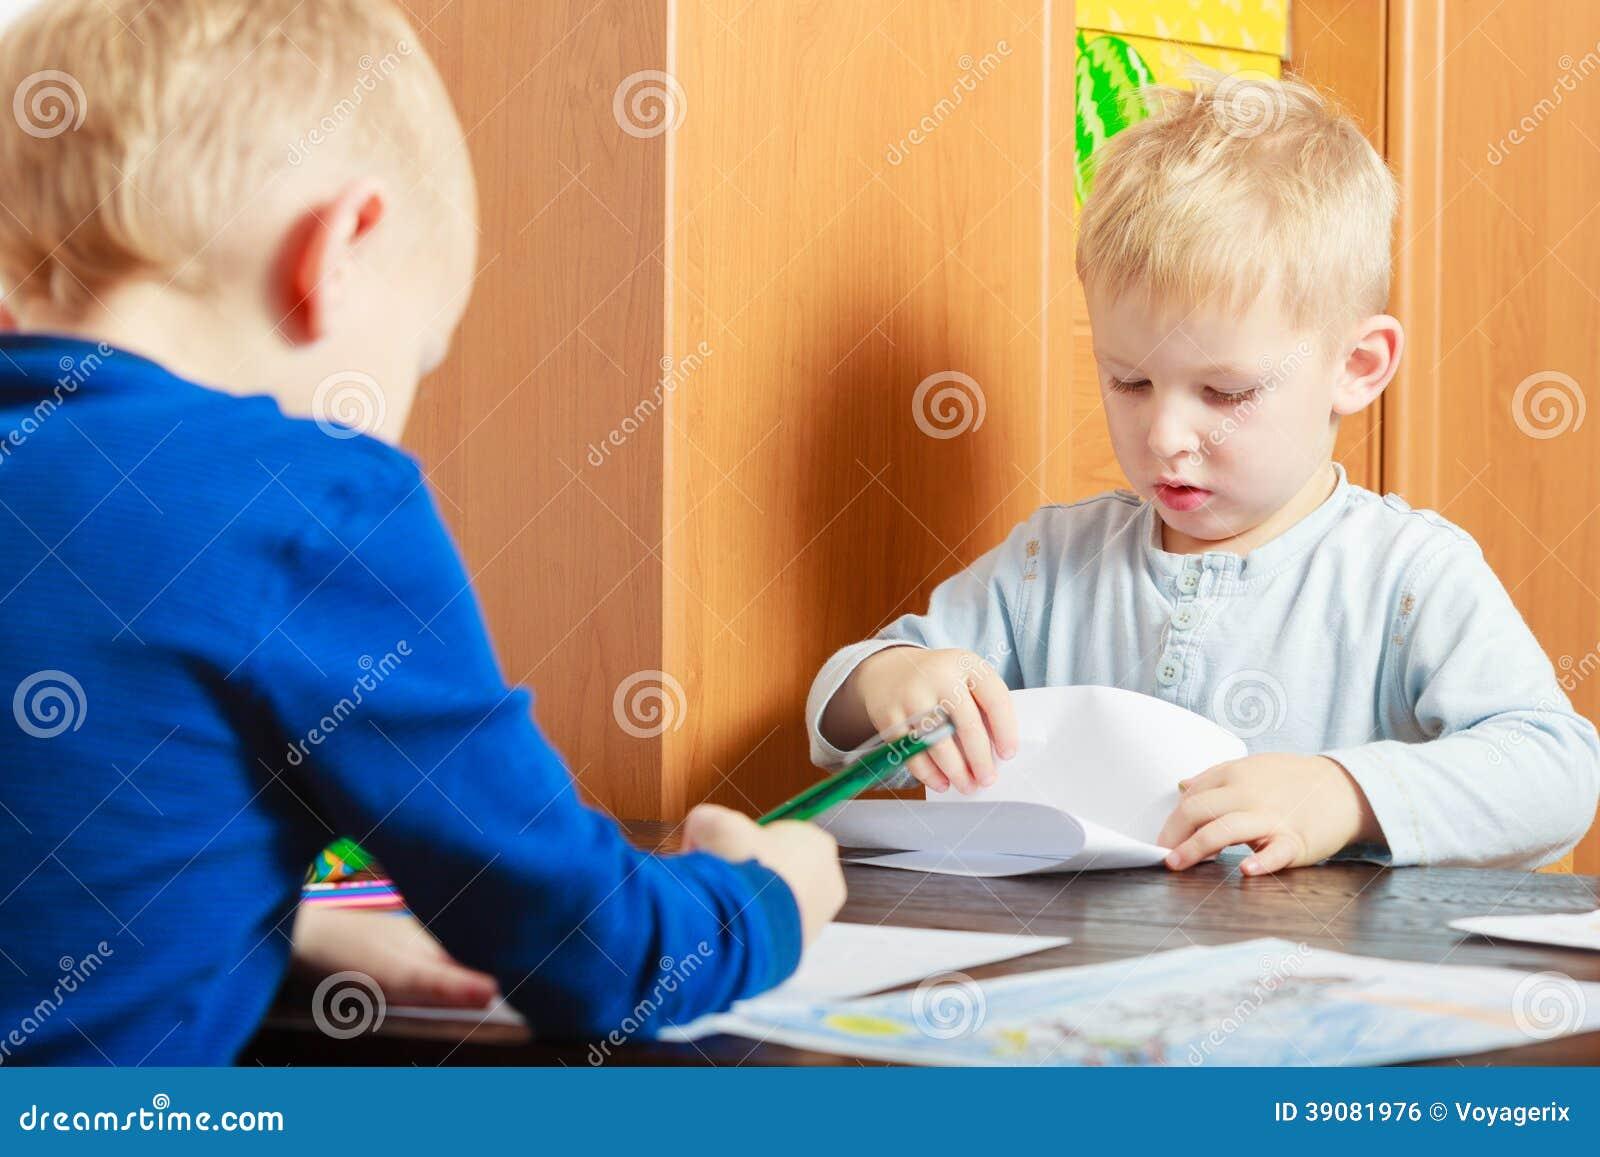 7 great ways to encourage kids' writing